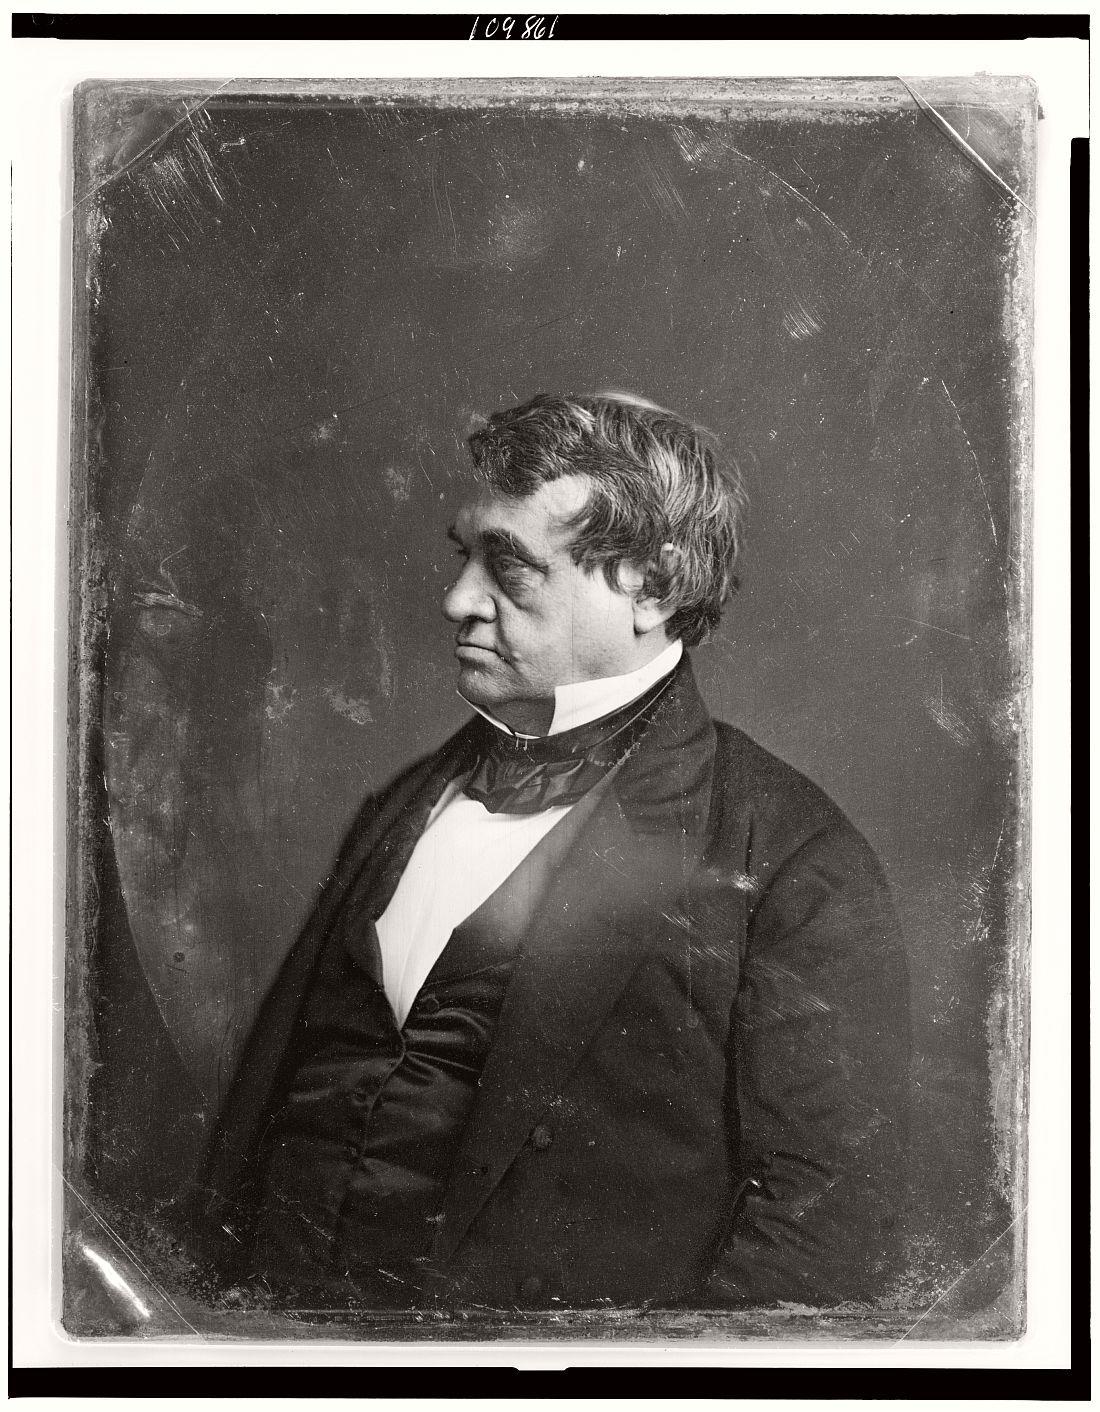 vintage-daguerreotype-portraits-from-xix-century-1844-1860-09